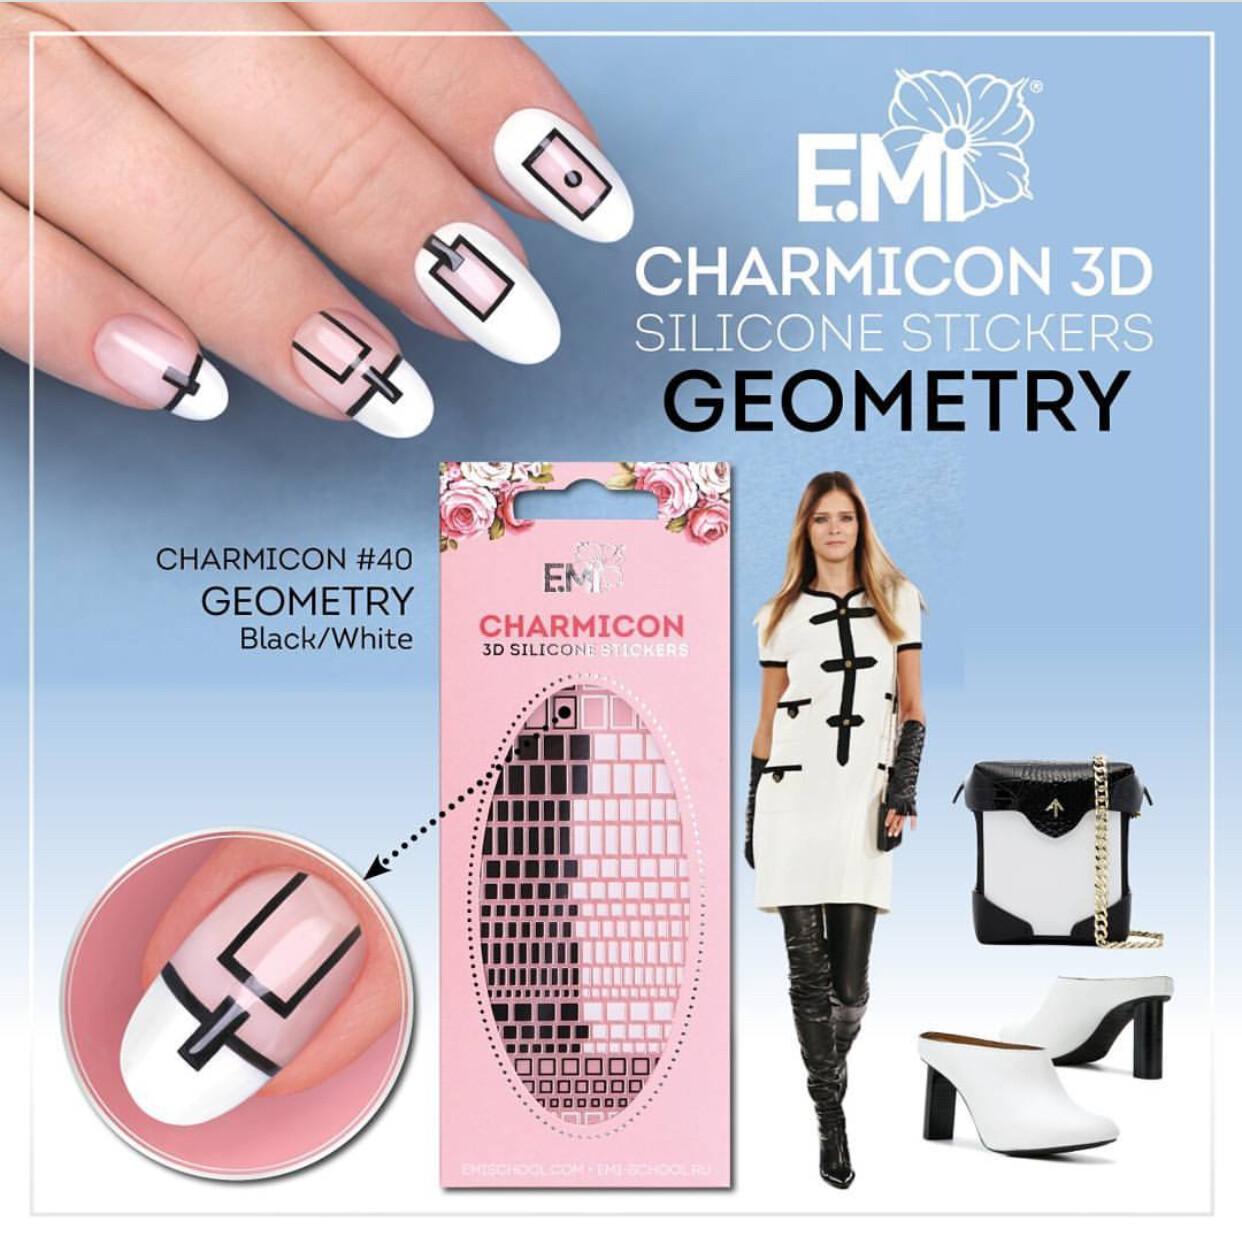 Charmicon Silicone Stickers #40 Geometry Black/White